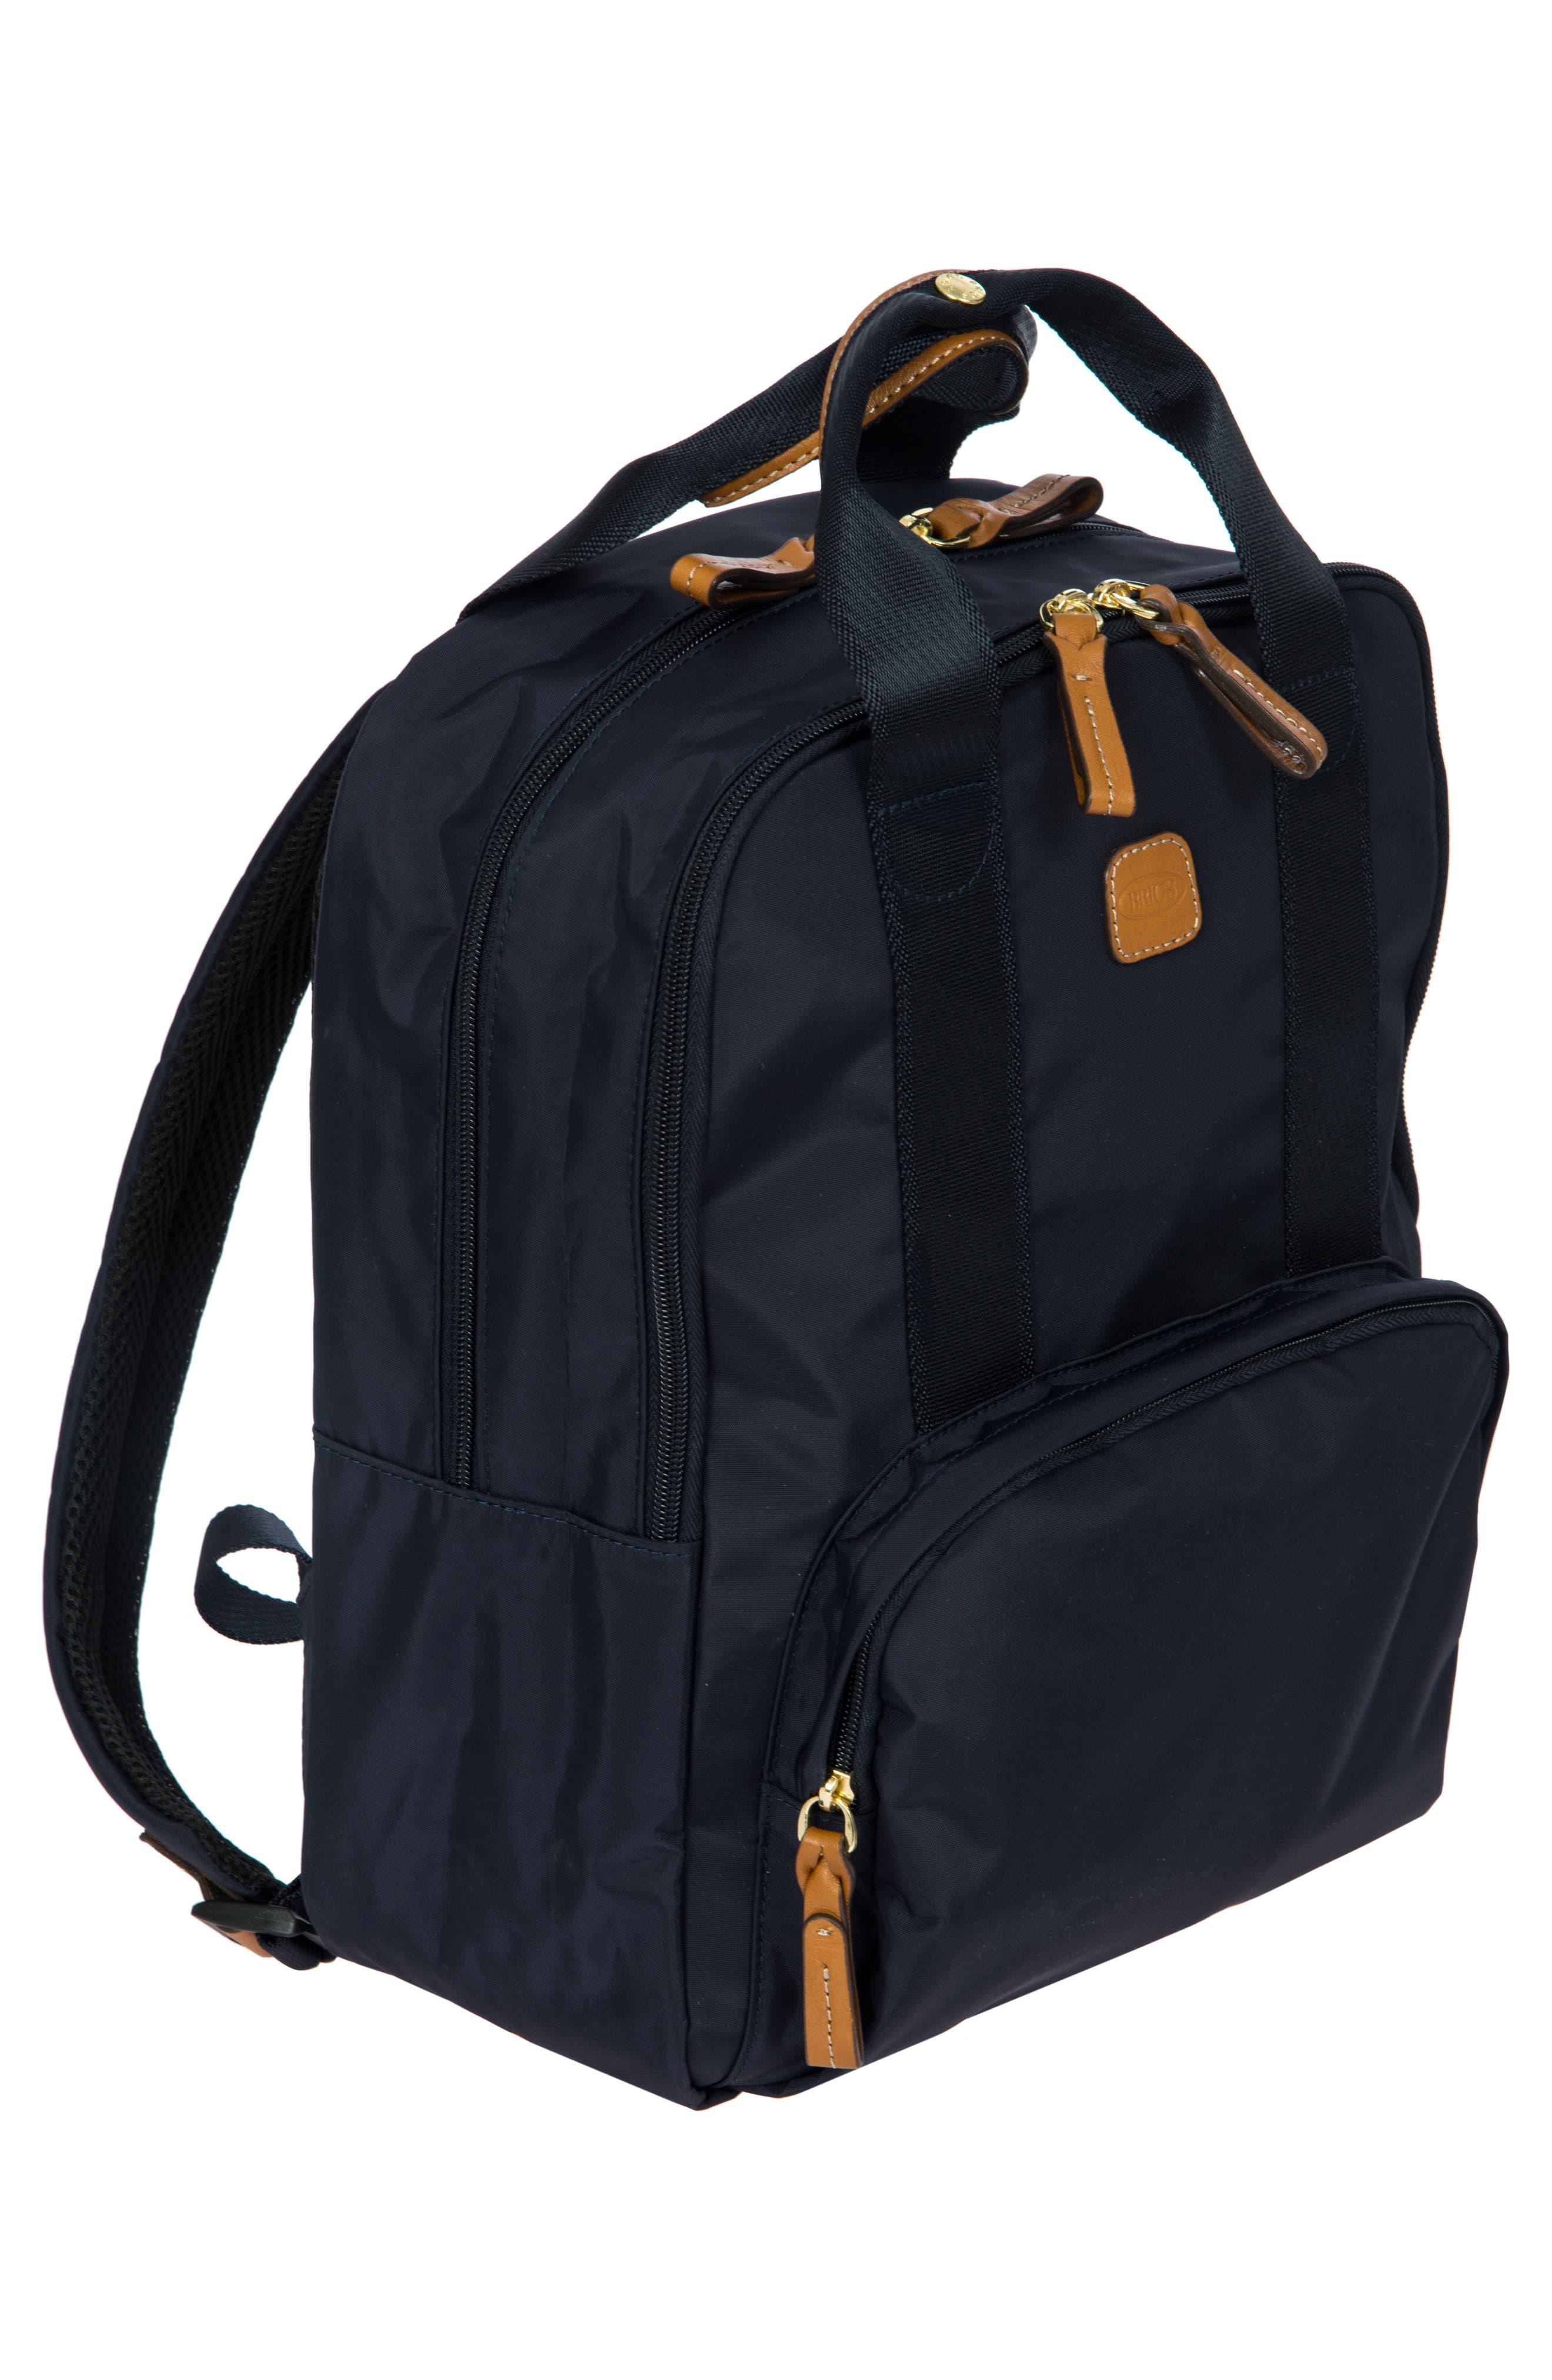 X-Bag Travel Urban Backpack,                             Alternate thumbnail 6, color,                             Navy